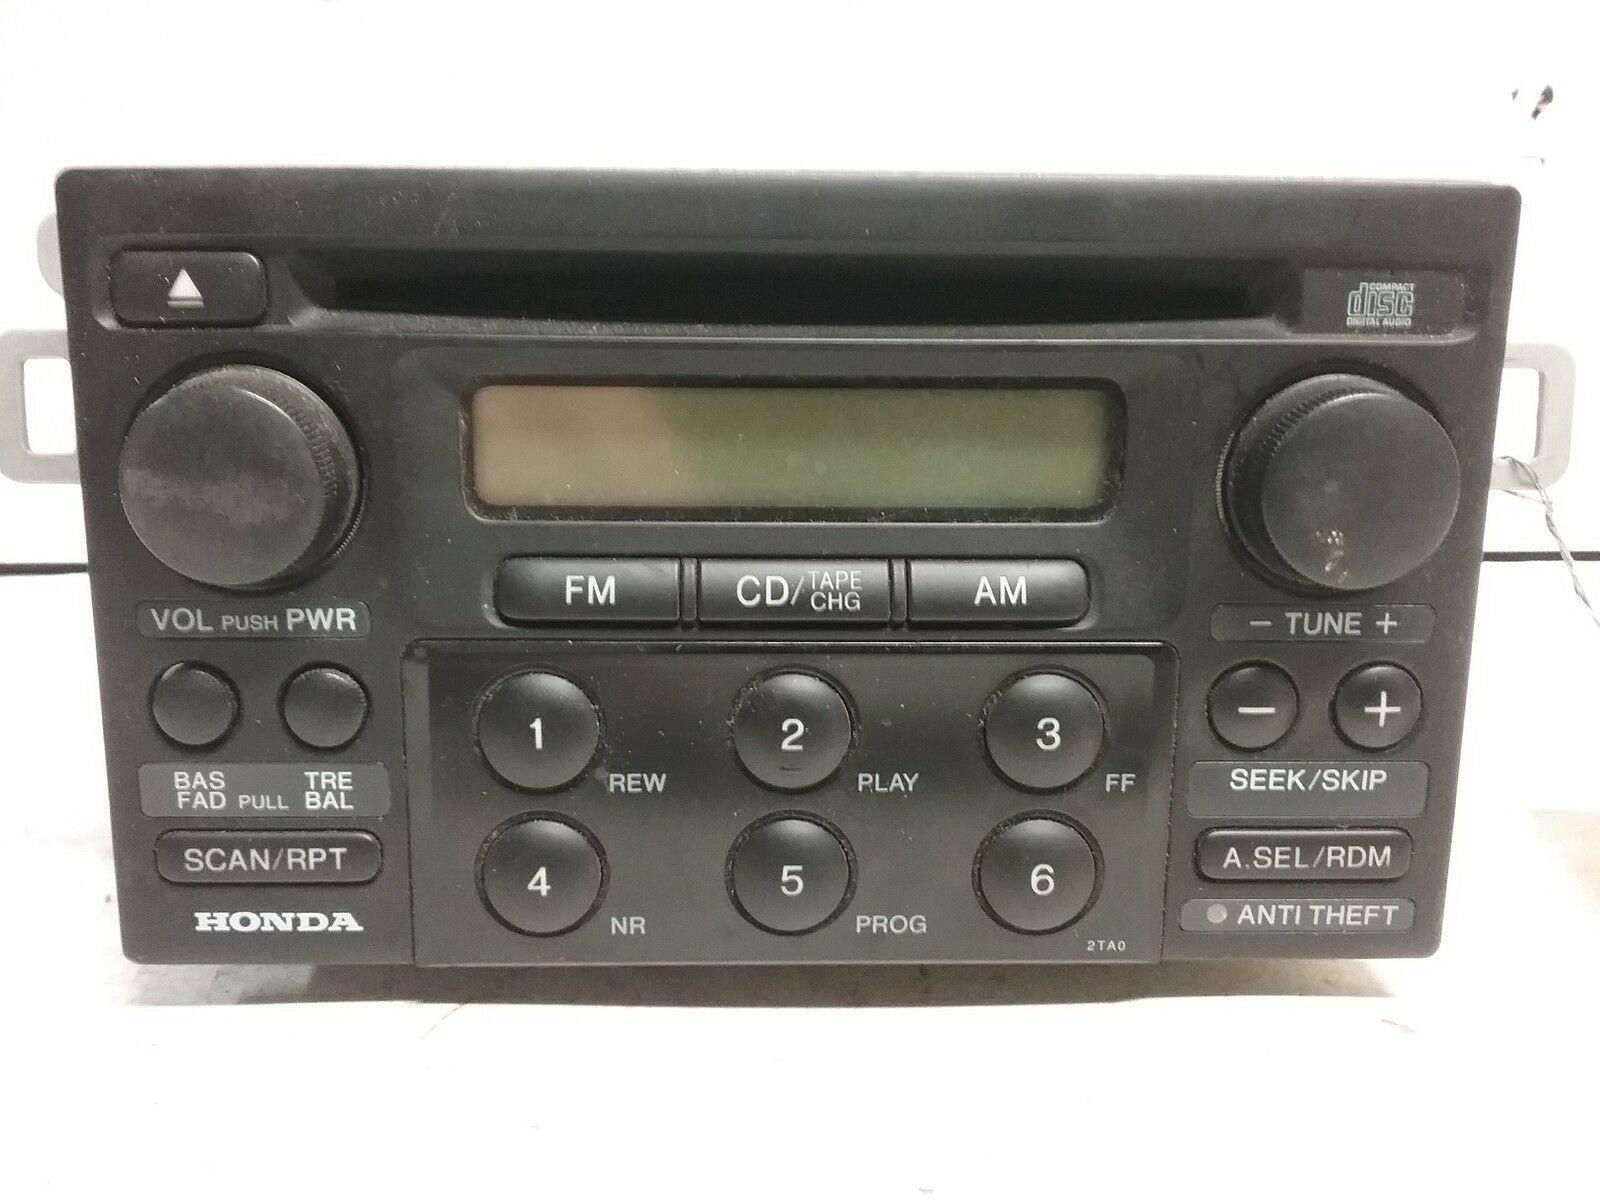 99 00 01 02 03 04 Honda Accord AM FM CD radio OEM 39101-S82-A230-M1 - $34.64